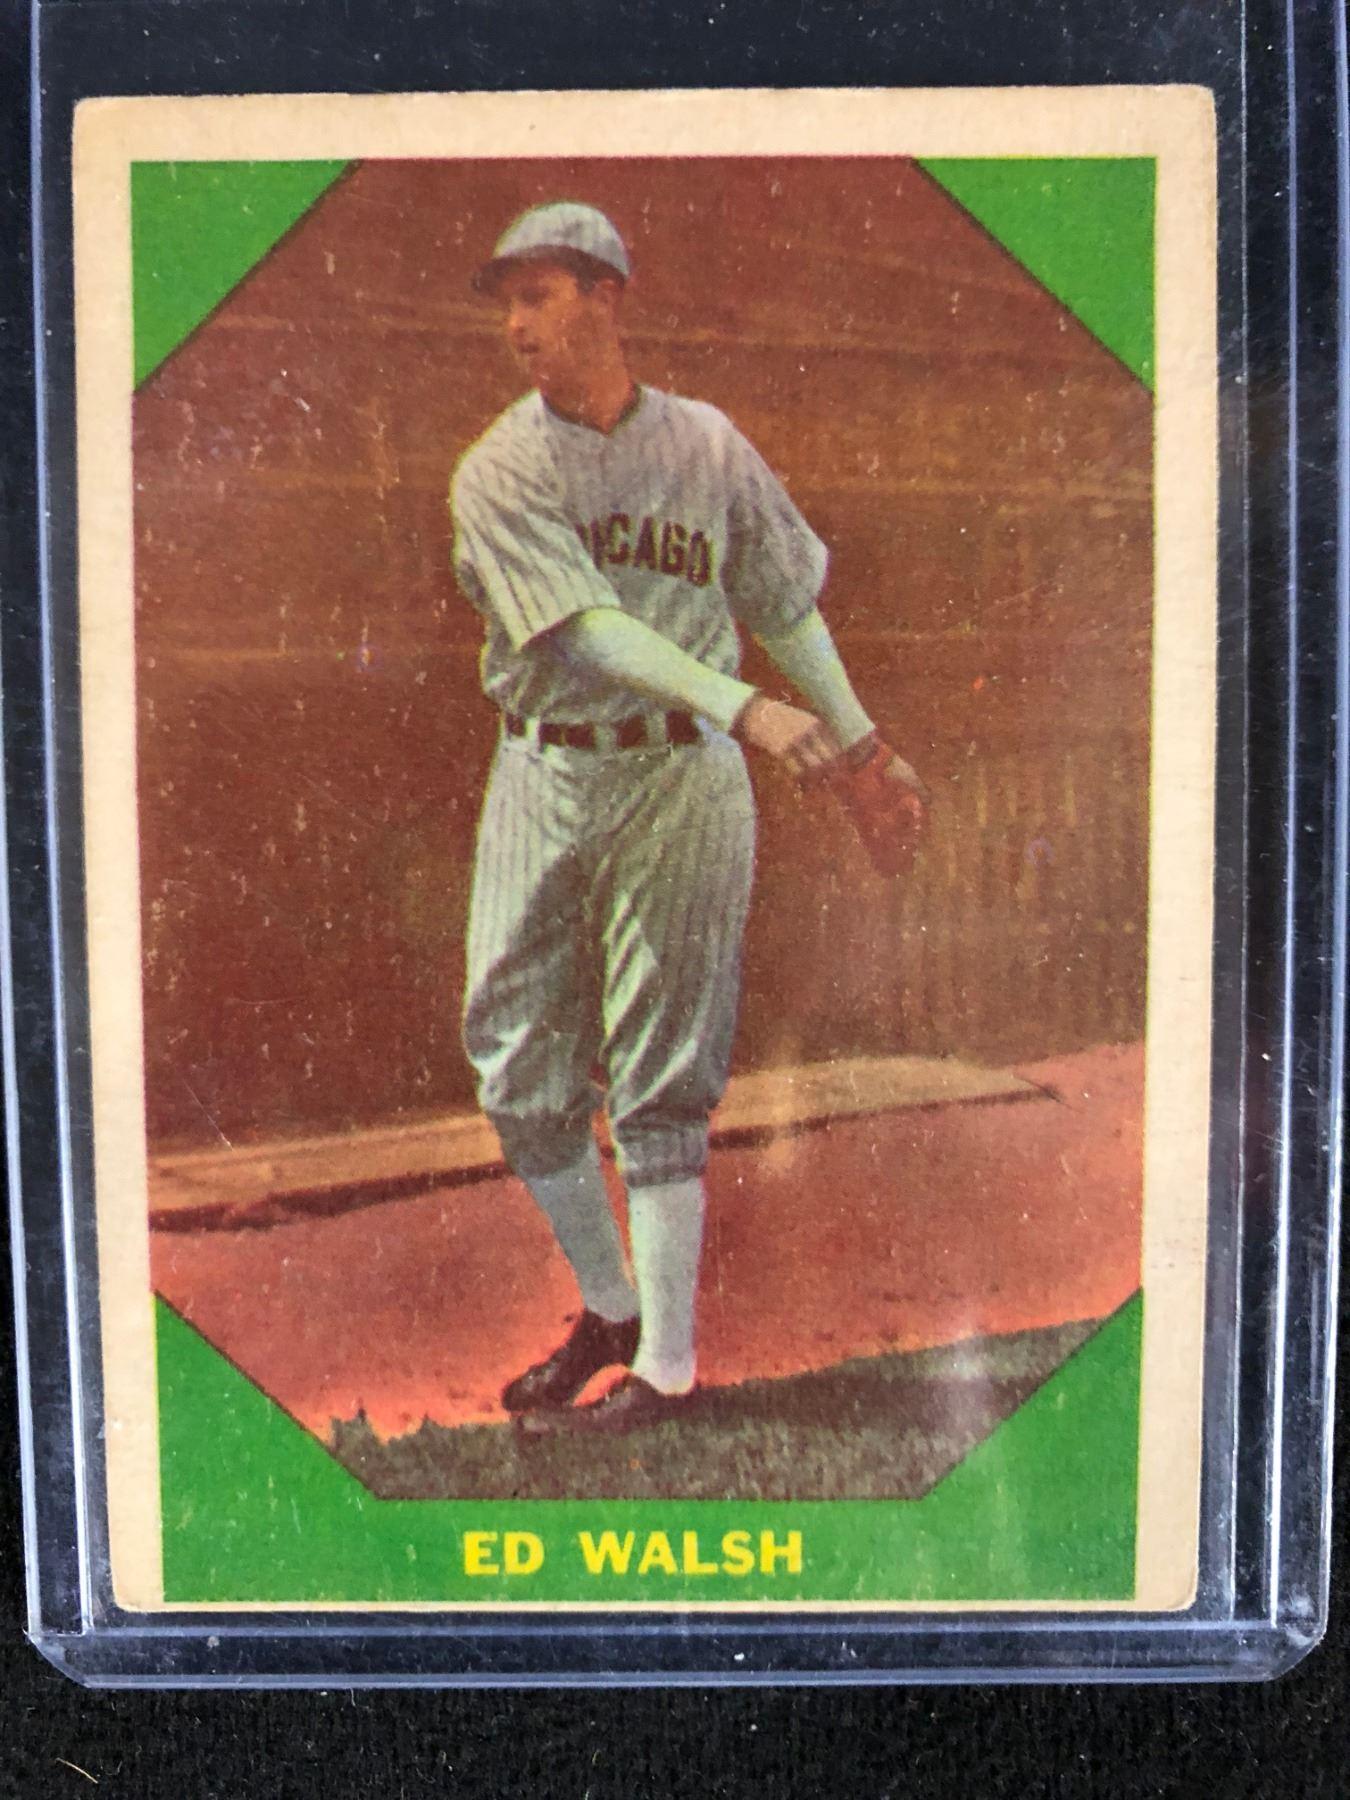 1960 Fleer All Time Greats Baseball Card 49 Ed Walsh